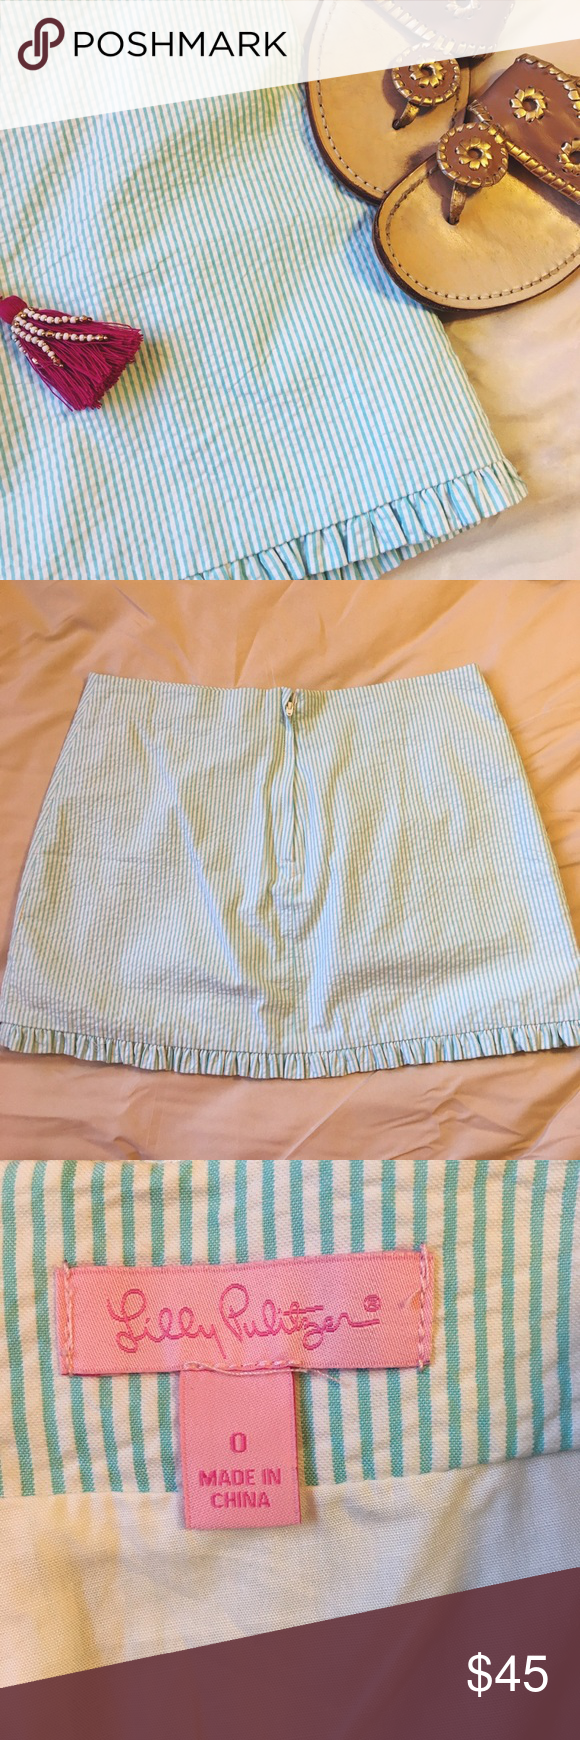 Light Blue Seersucker Lilly Pulitzer Skirt Perfect condition. Seersucker mini skirt. Small ruffle hem. Zipper in the back. 💖 Lilly Pulitzer Skirts Mini